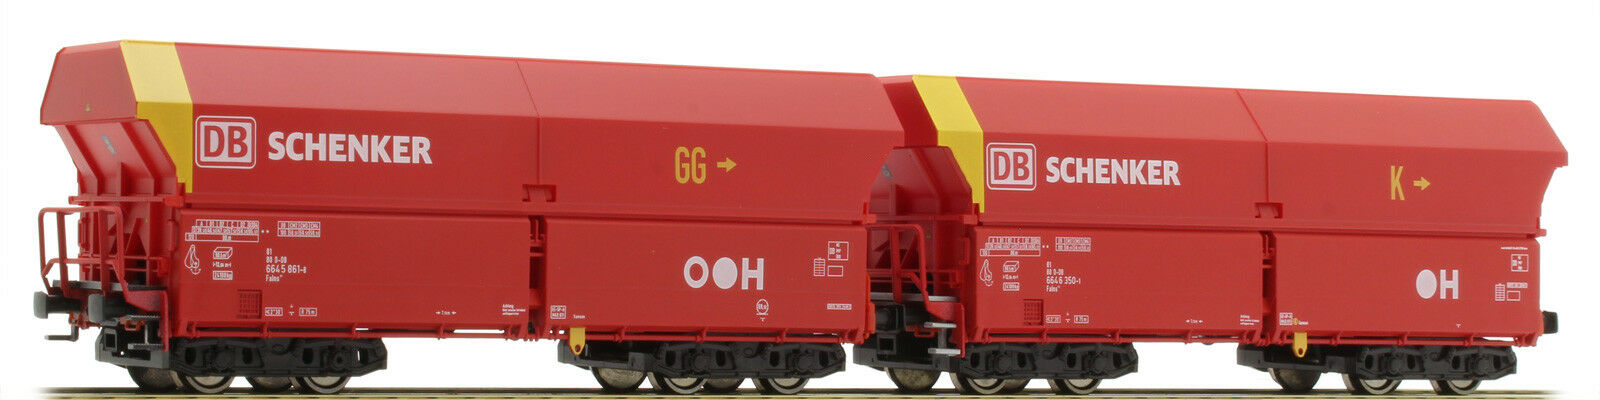 per poco costoso Mehano 58869 2er Set Di Costruzione Falns 121 erzwagen DB DB DB Schenker testzug NUOVO UVP 65,99  in vendita